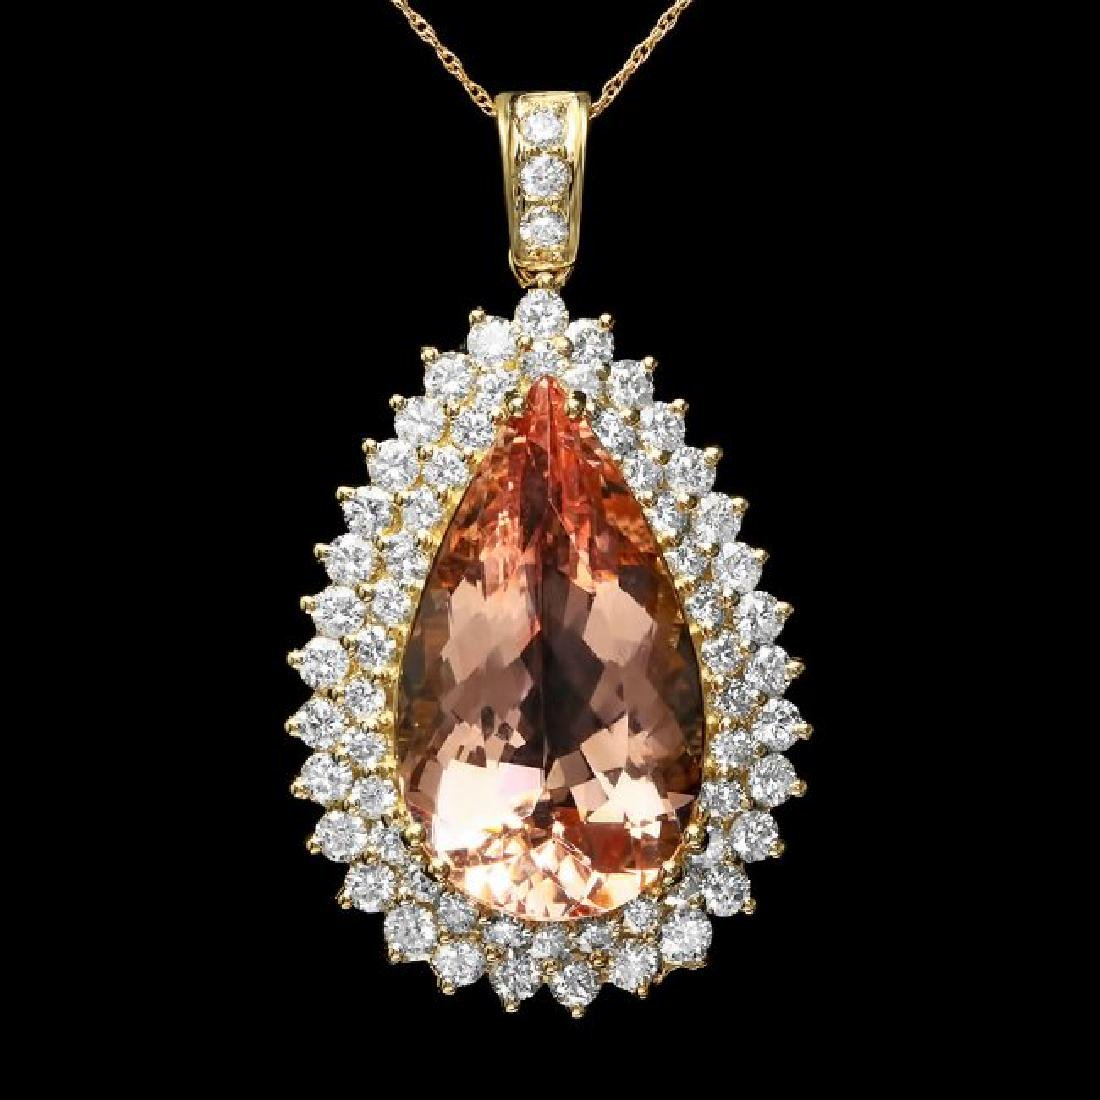 14k Gold 20.00ct Morganite 3.50ct Diamond Pendant